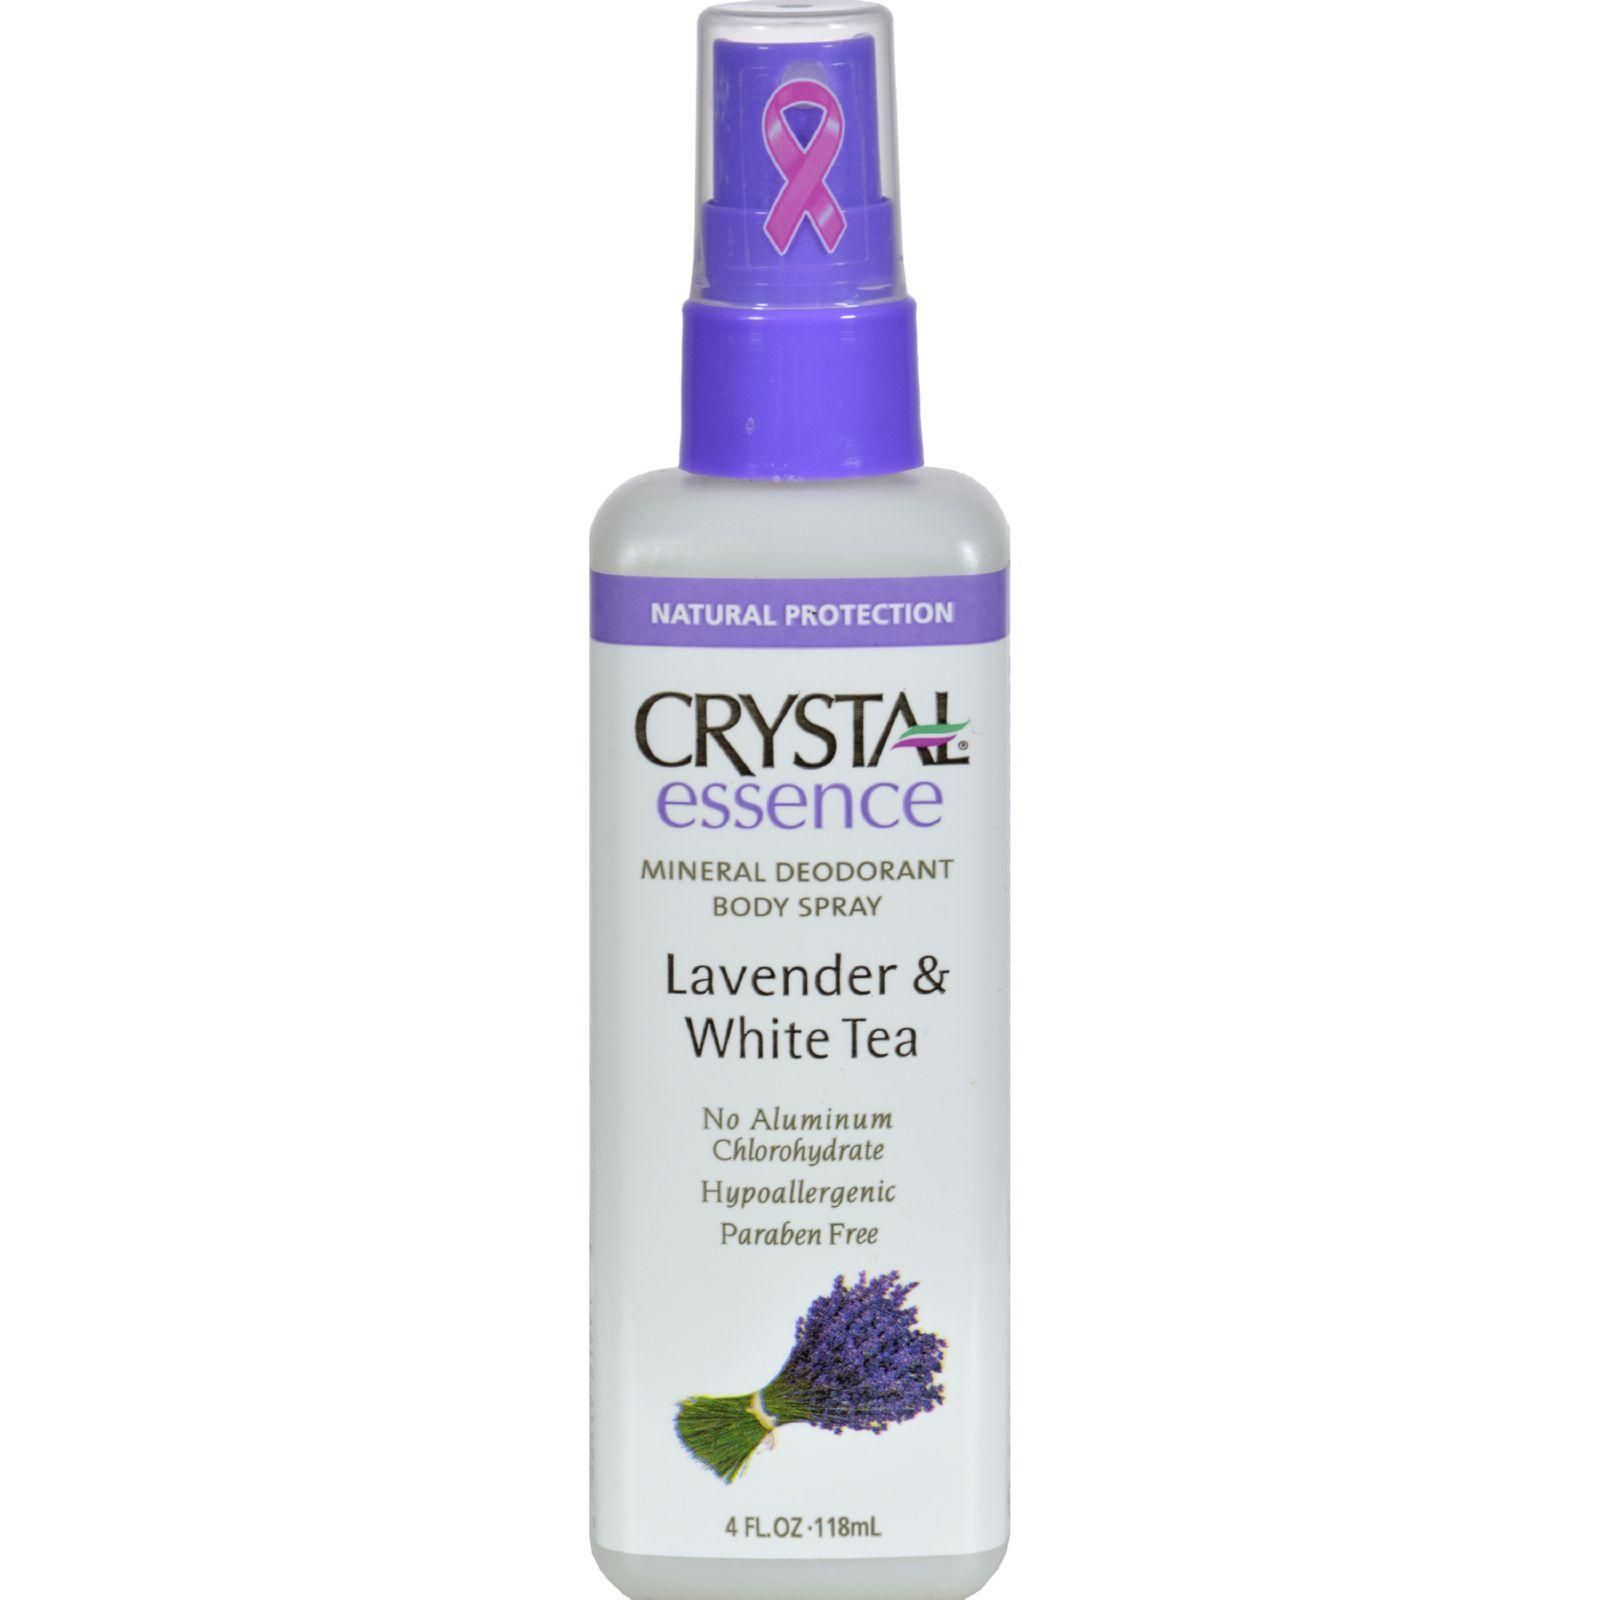 Crystal Essence Mineral Deodorant Body Spray Lavender And